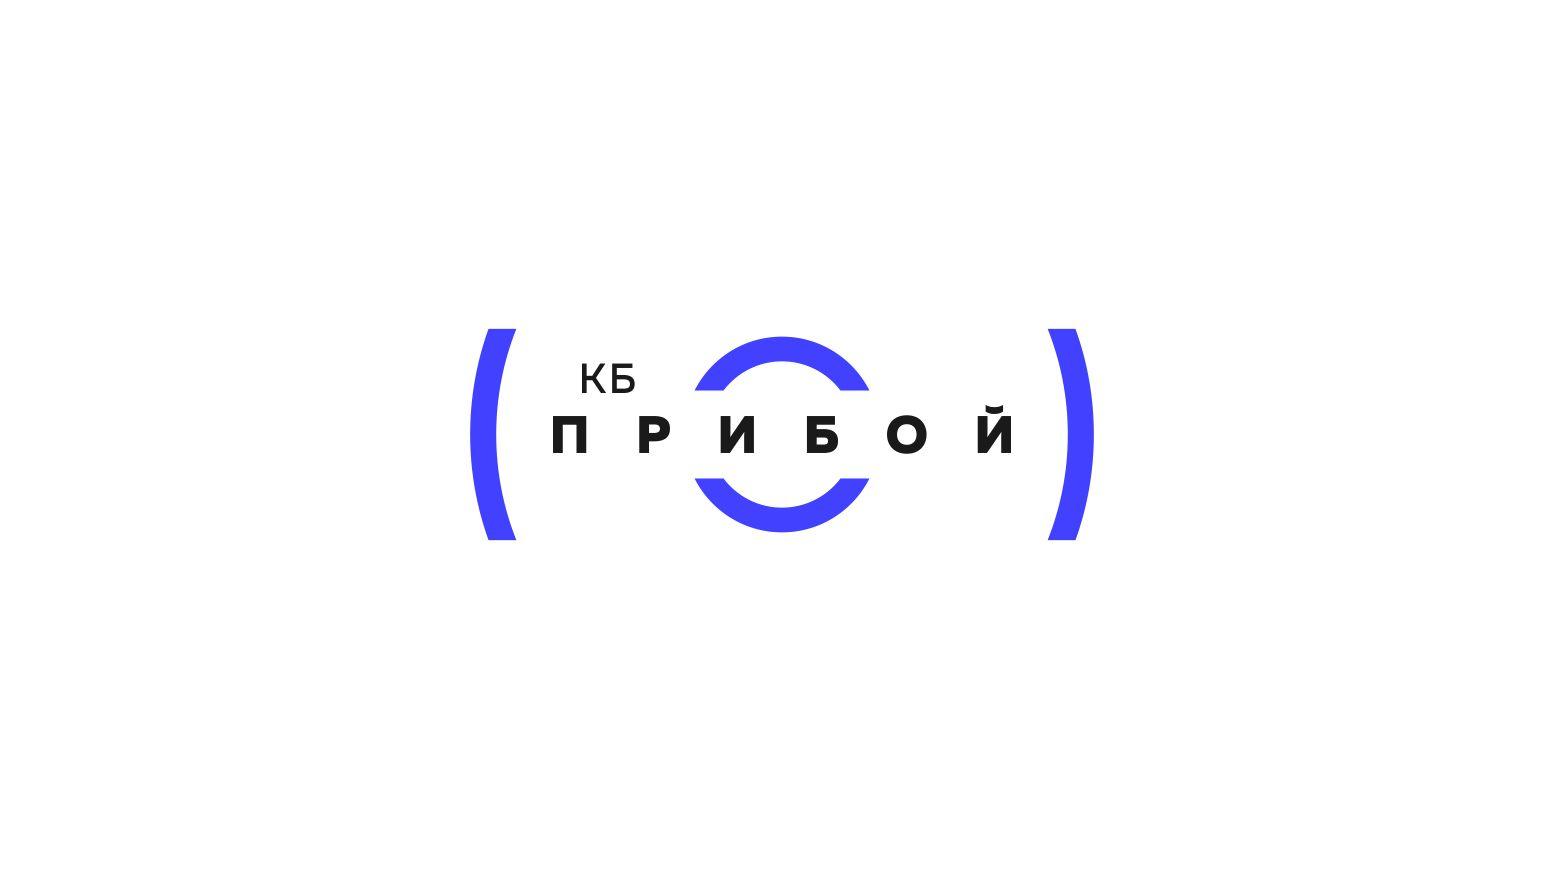 Разработка логотипа и фирменного стиля для КБ Прибой фото f_0835b2c03a80d108.jpg